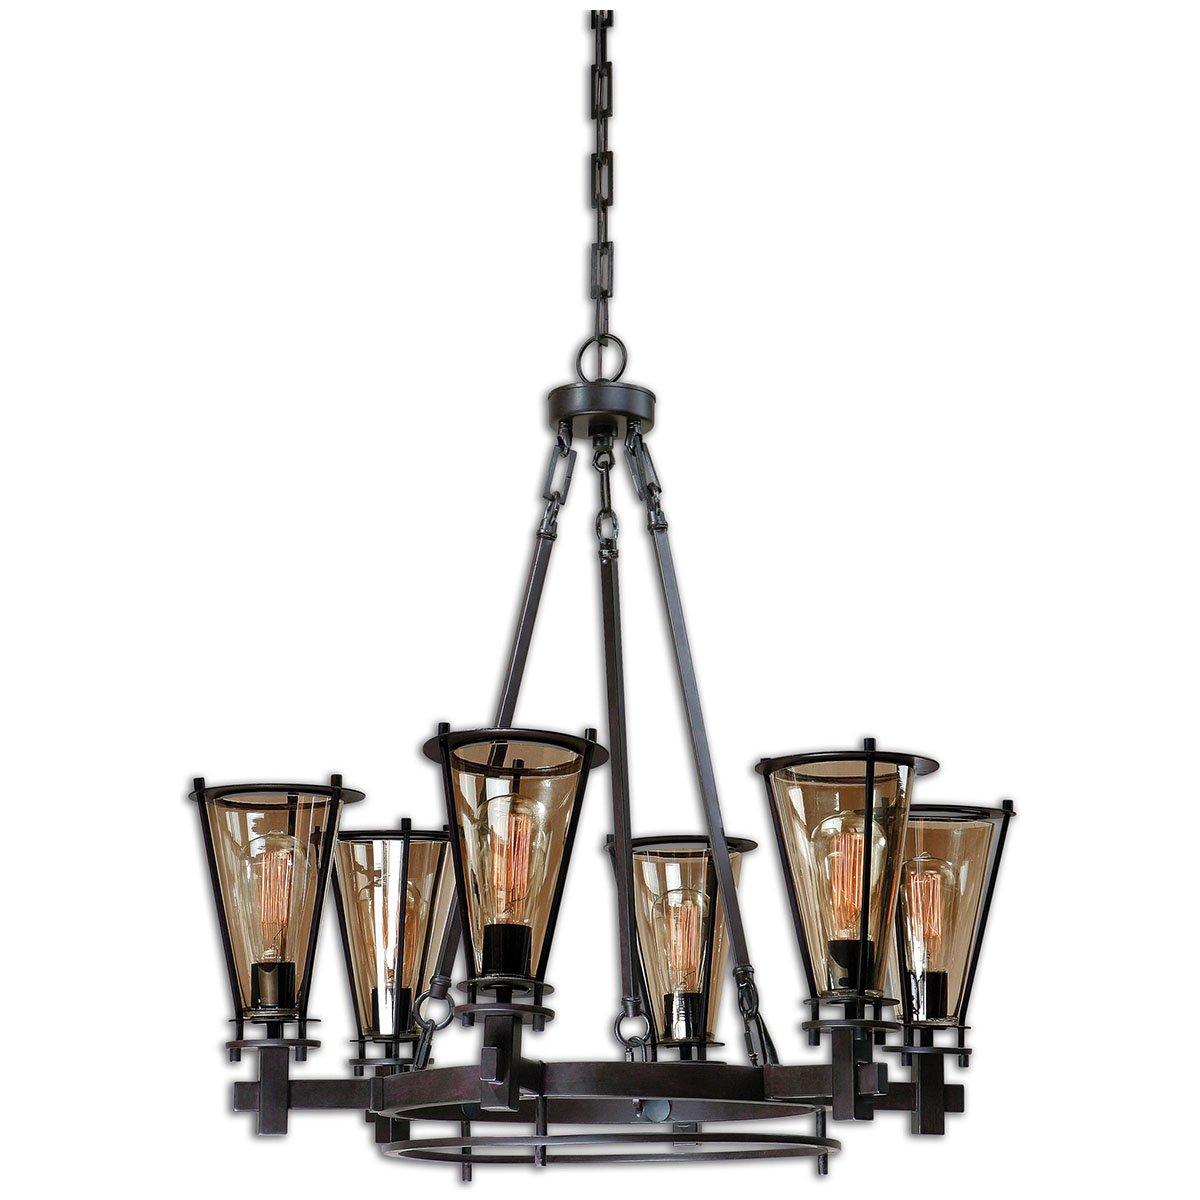 Amazon uttermost 21263 frisco 6 light metal chandelier home amazon uttermost 21263 frisco 6 light metal chandelier home kitchen aloadofball Images